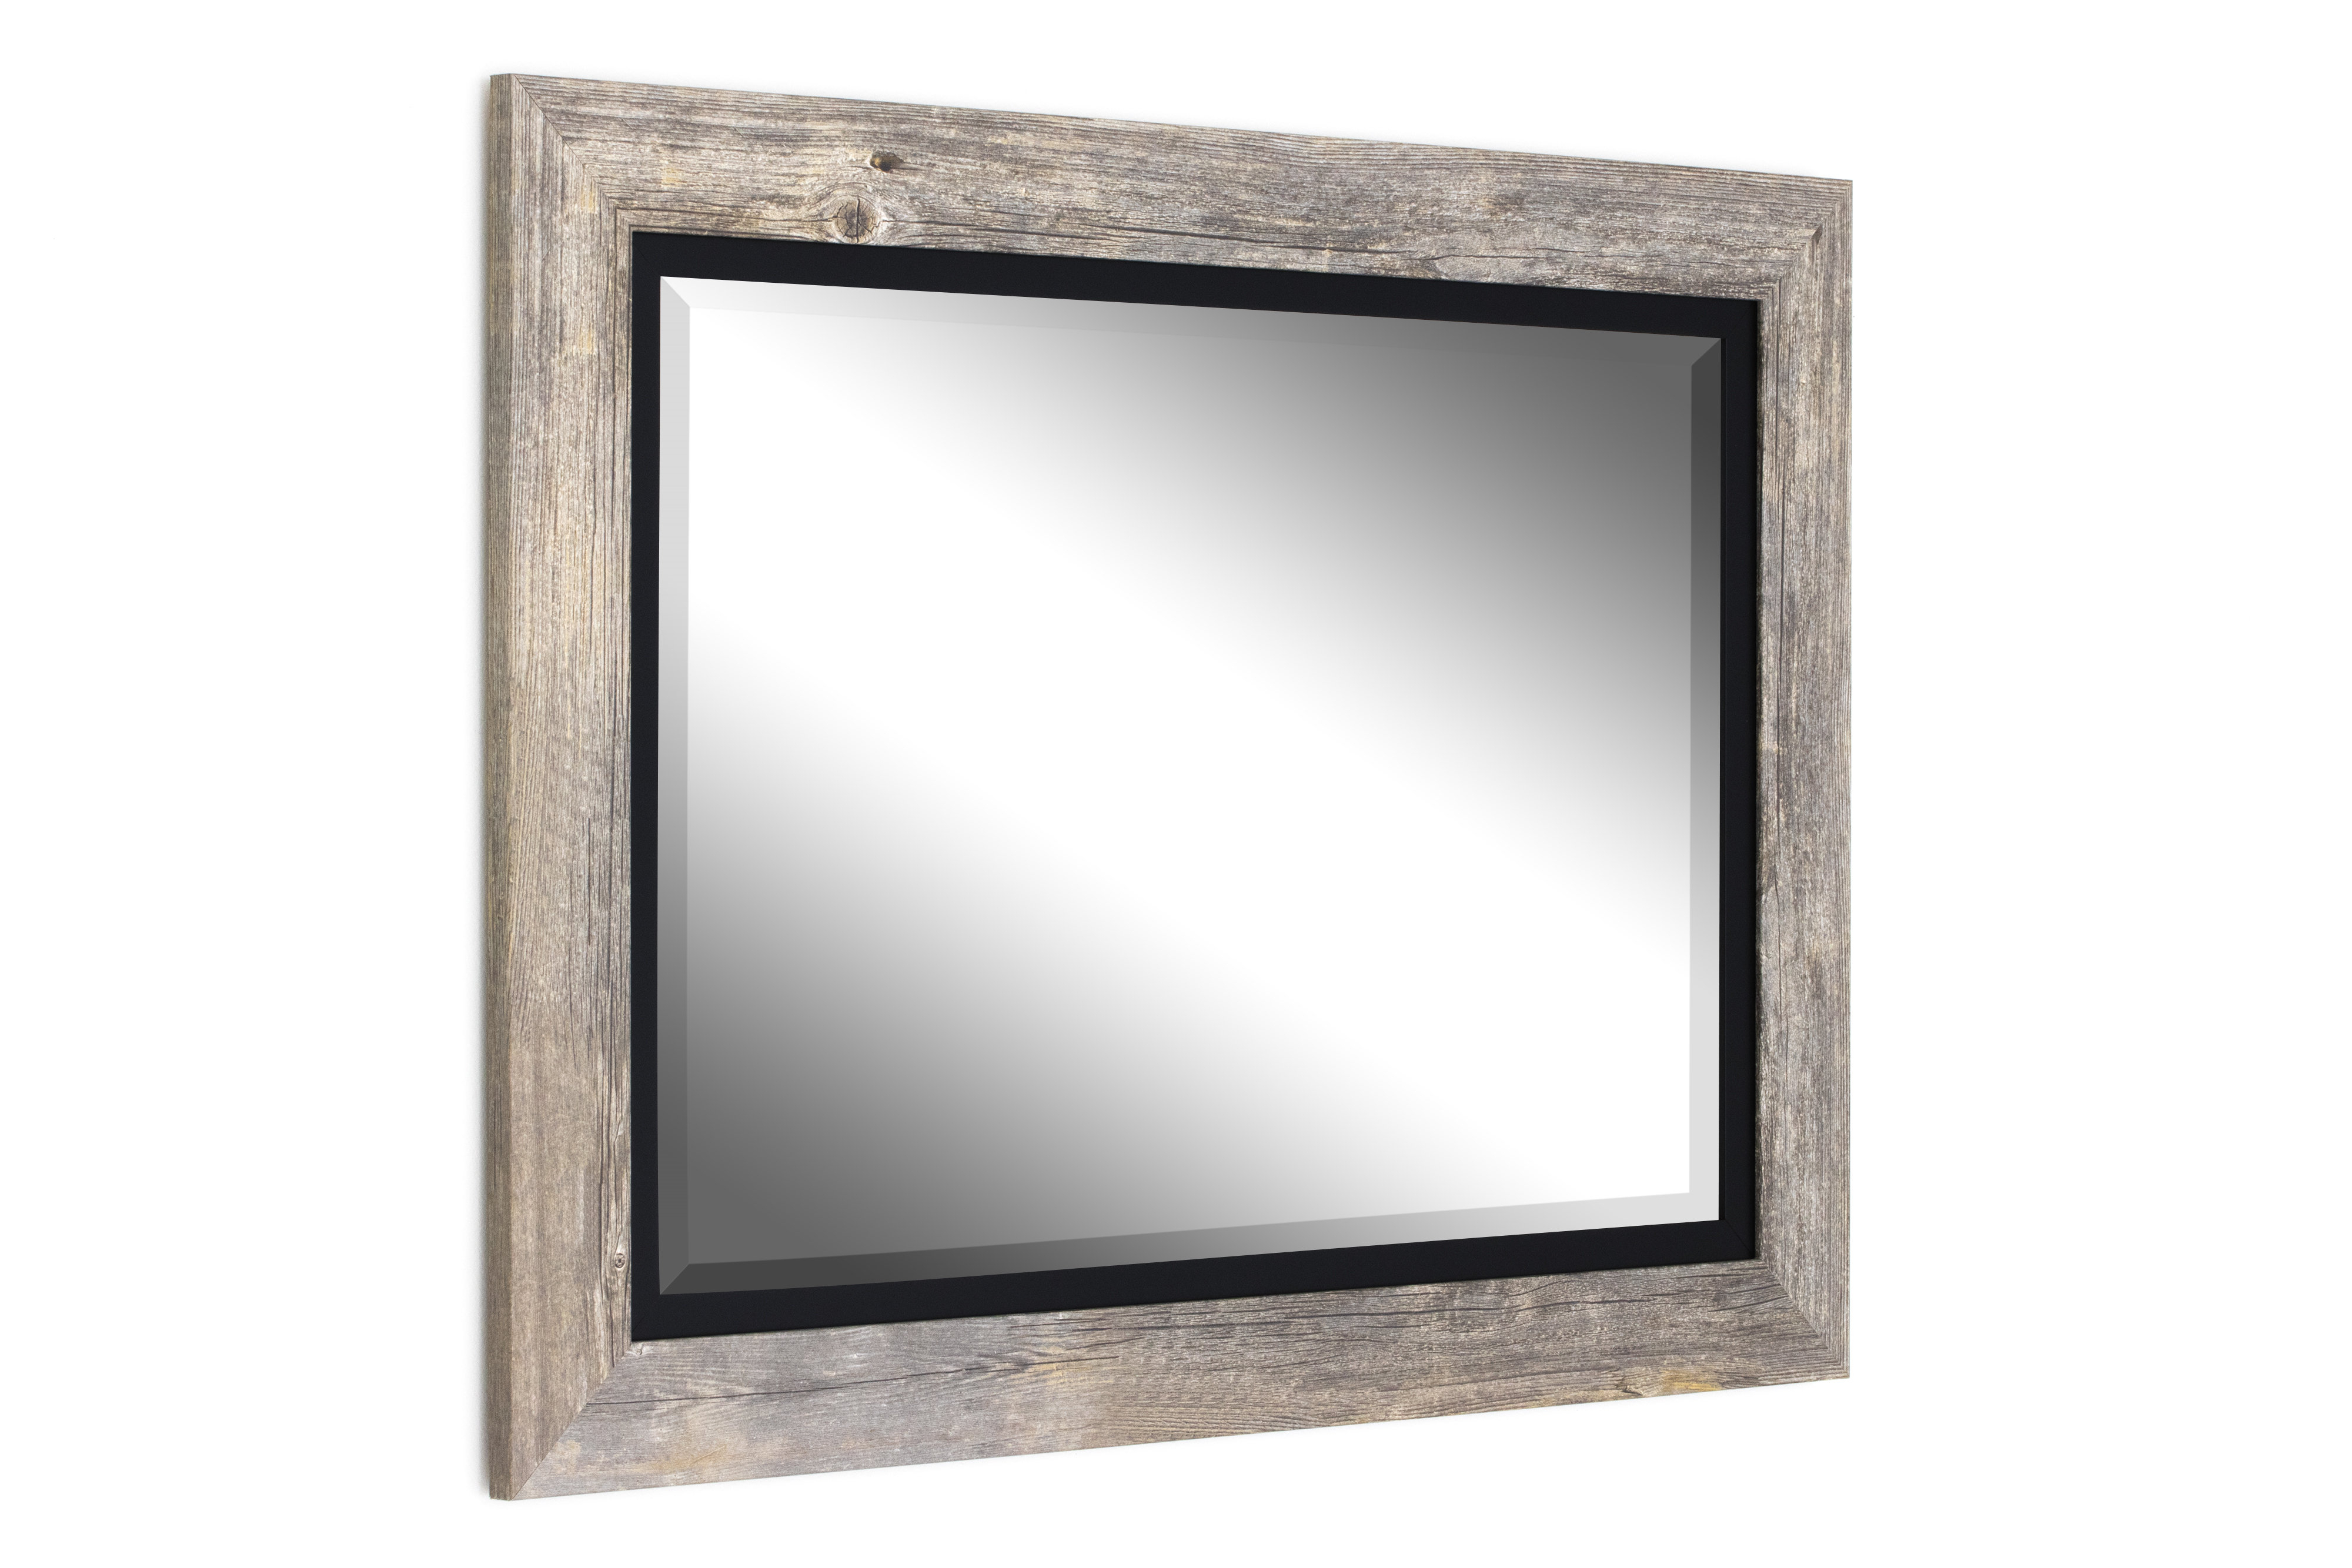 Hilde Traditional Beveled Bathroom Mirror Regarding Famous Hilde Traditional Beveled Bathroom Mirrors (Gallery 1 of 20)